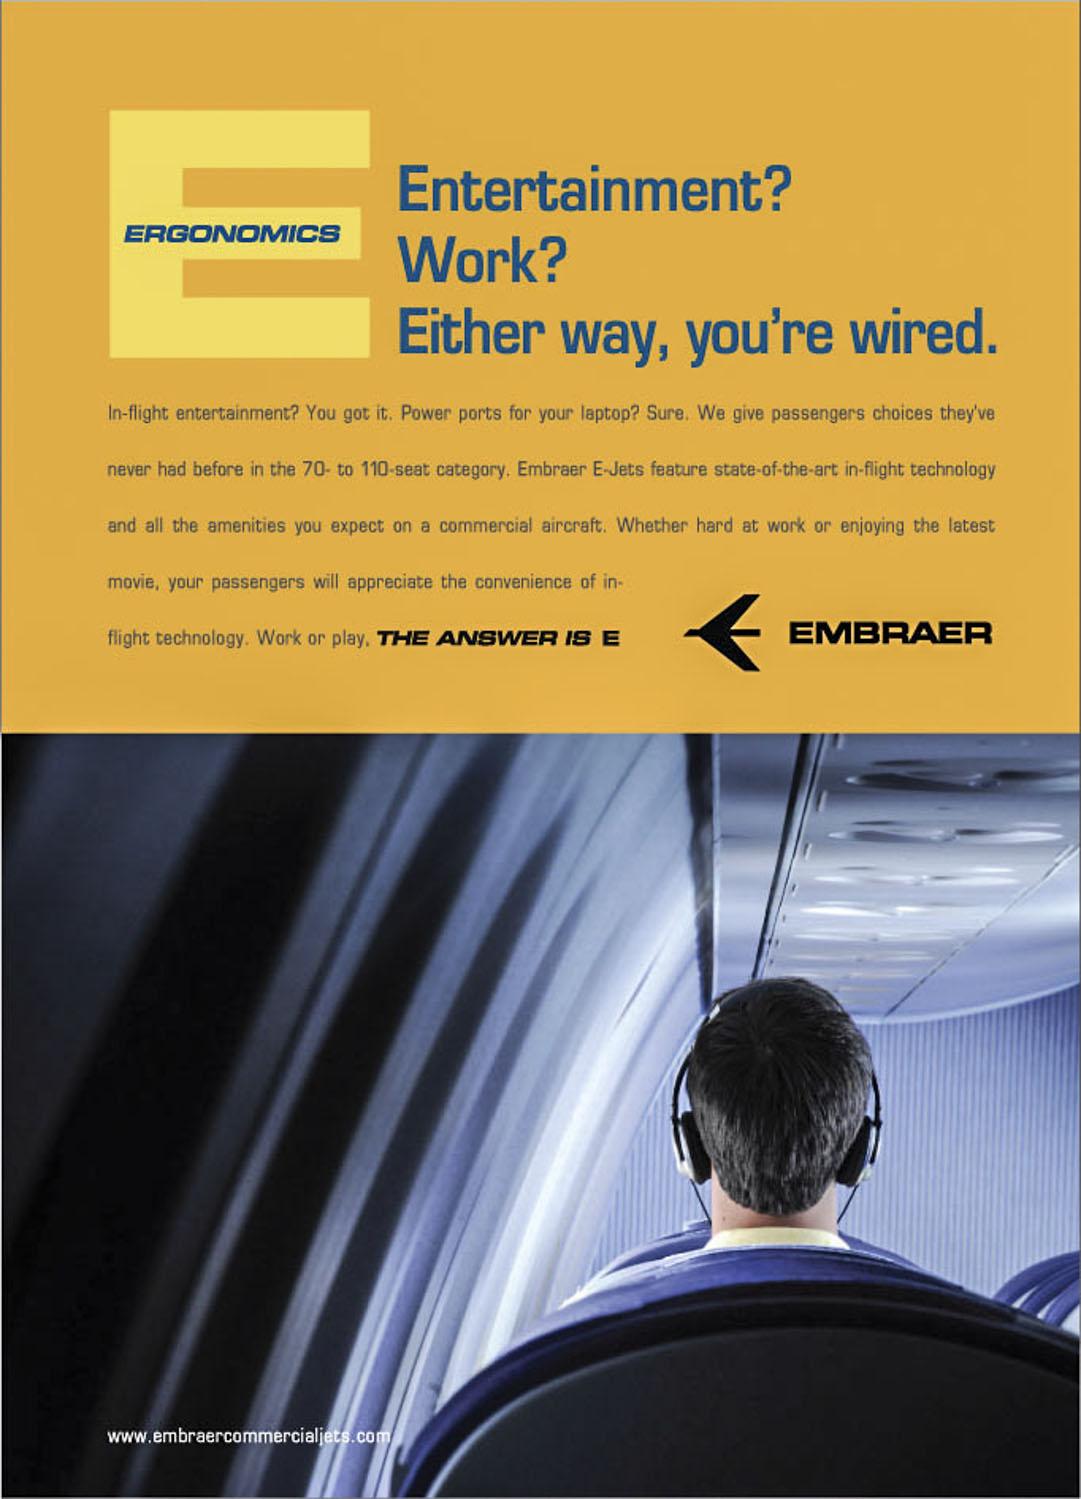 EMBRAER Ad Campaign